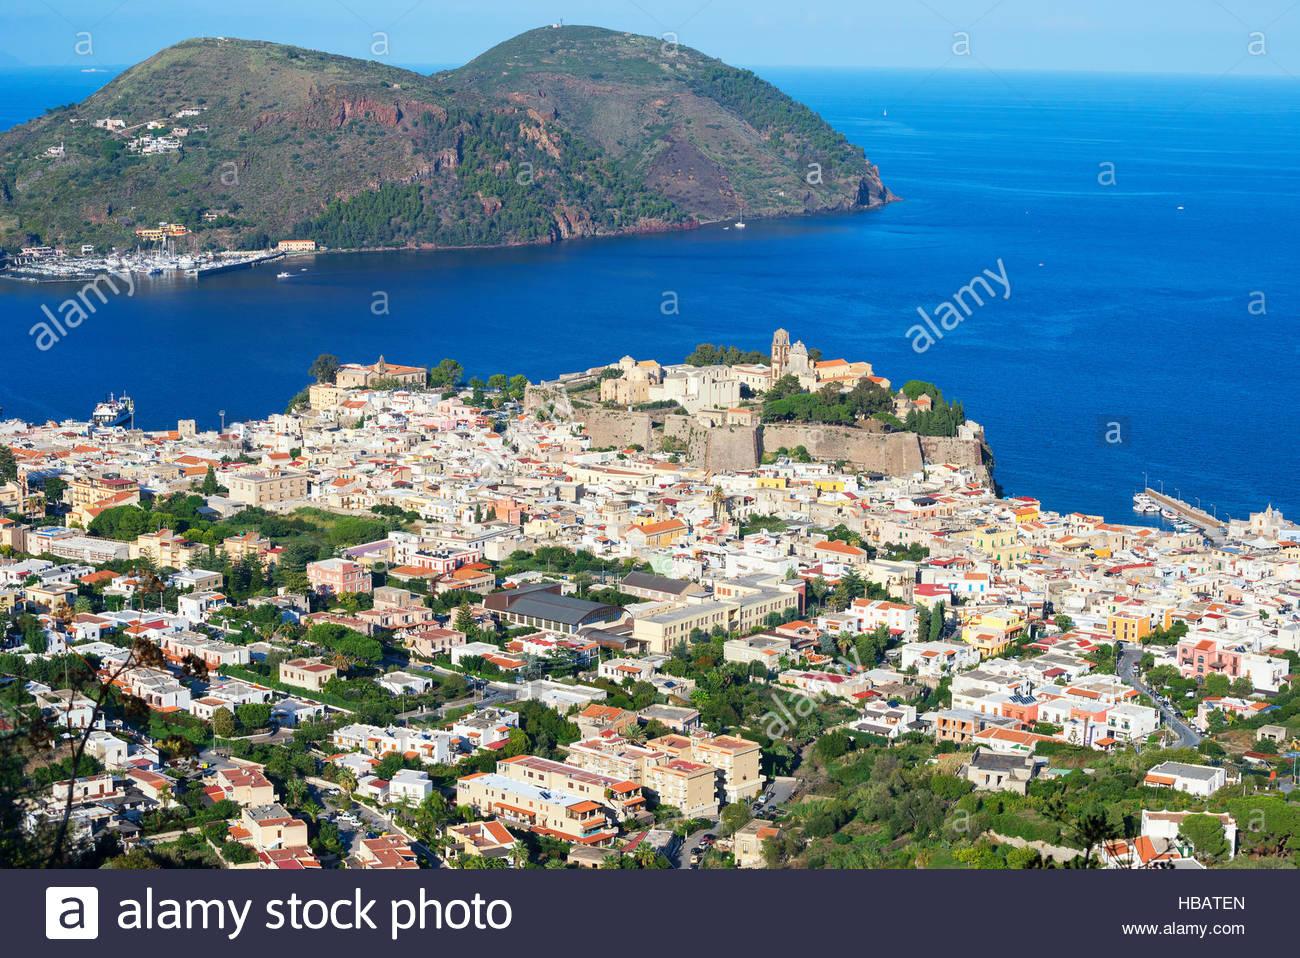 Vista de la ciudad de Lipari, Sicilia, Italia Imagen De Stock